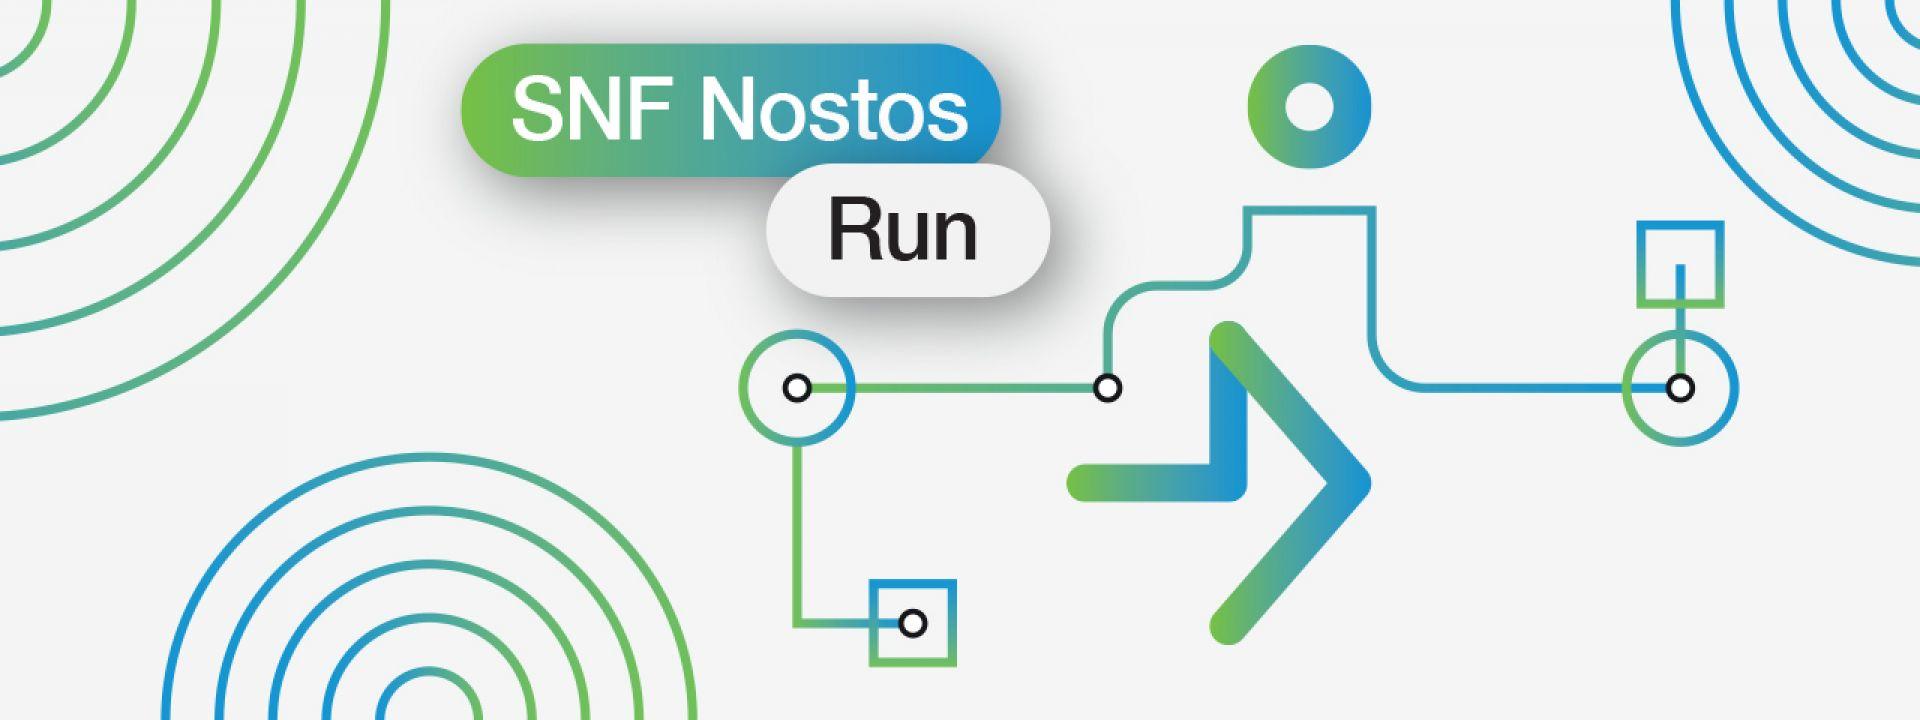 SNF Nostos Run 2021: Running towards the Future - Εικόνα